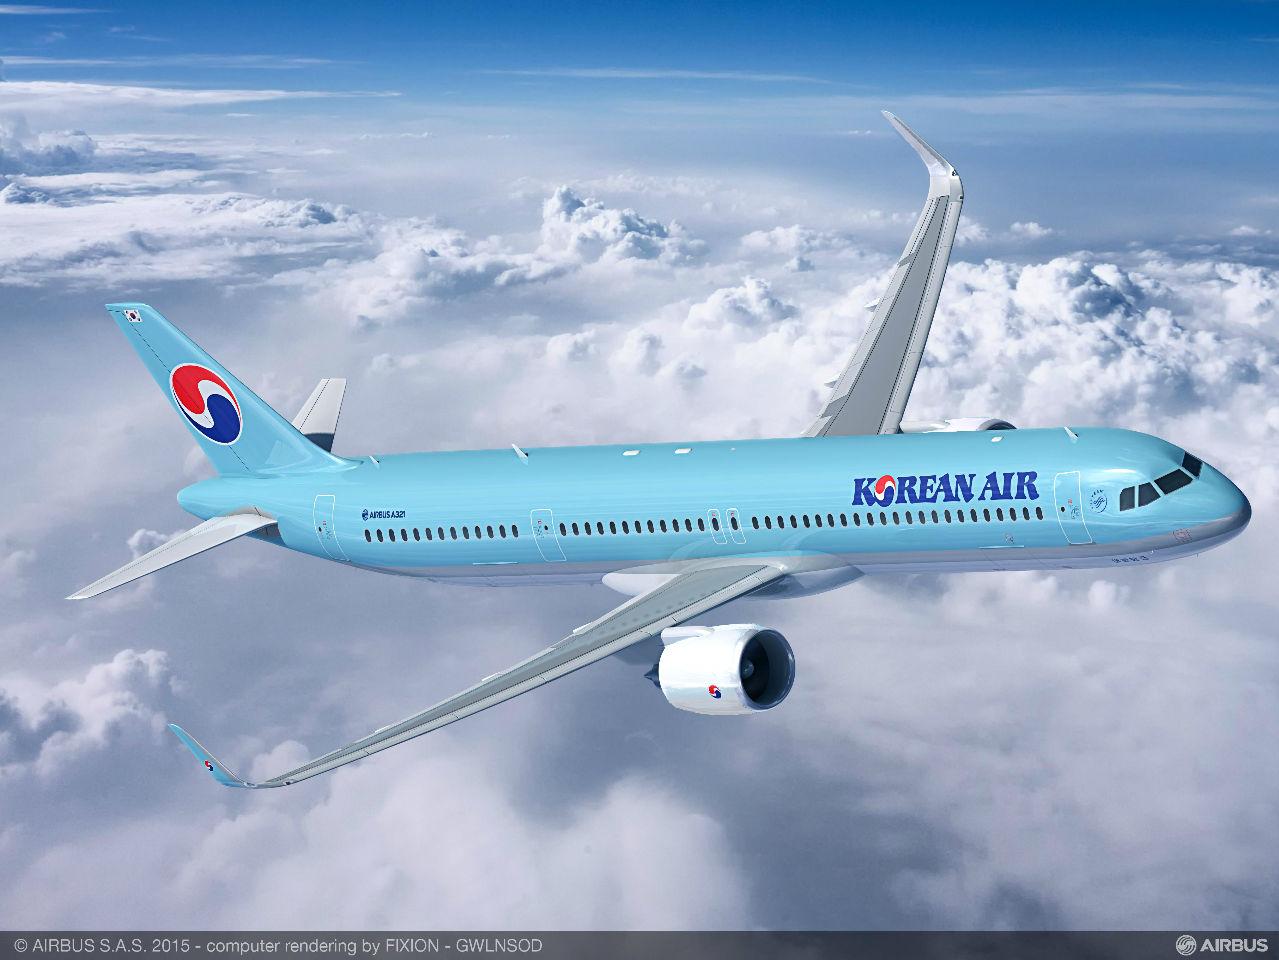 Korean Air joins Airbus' Wing of Tomorrow program effort